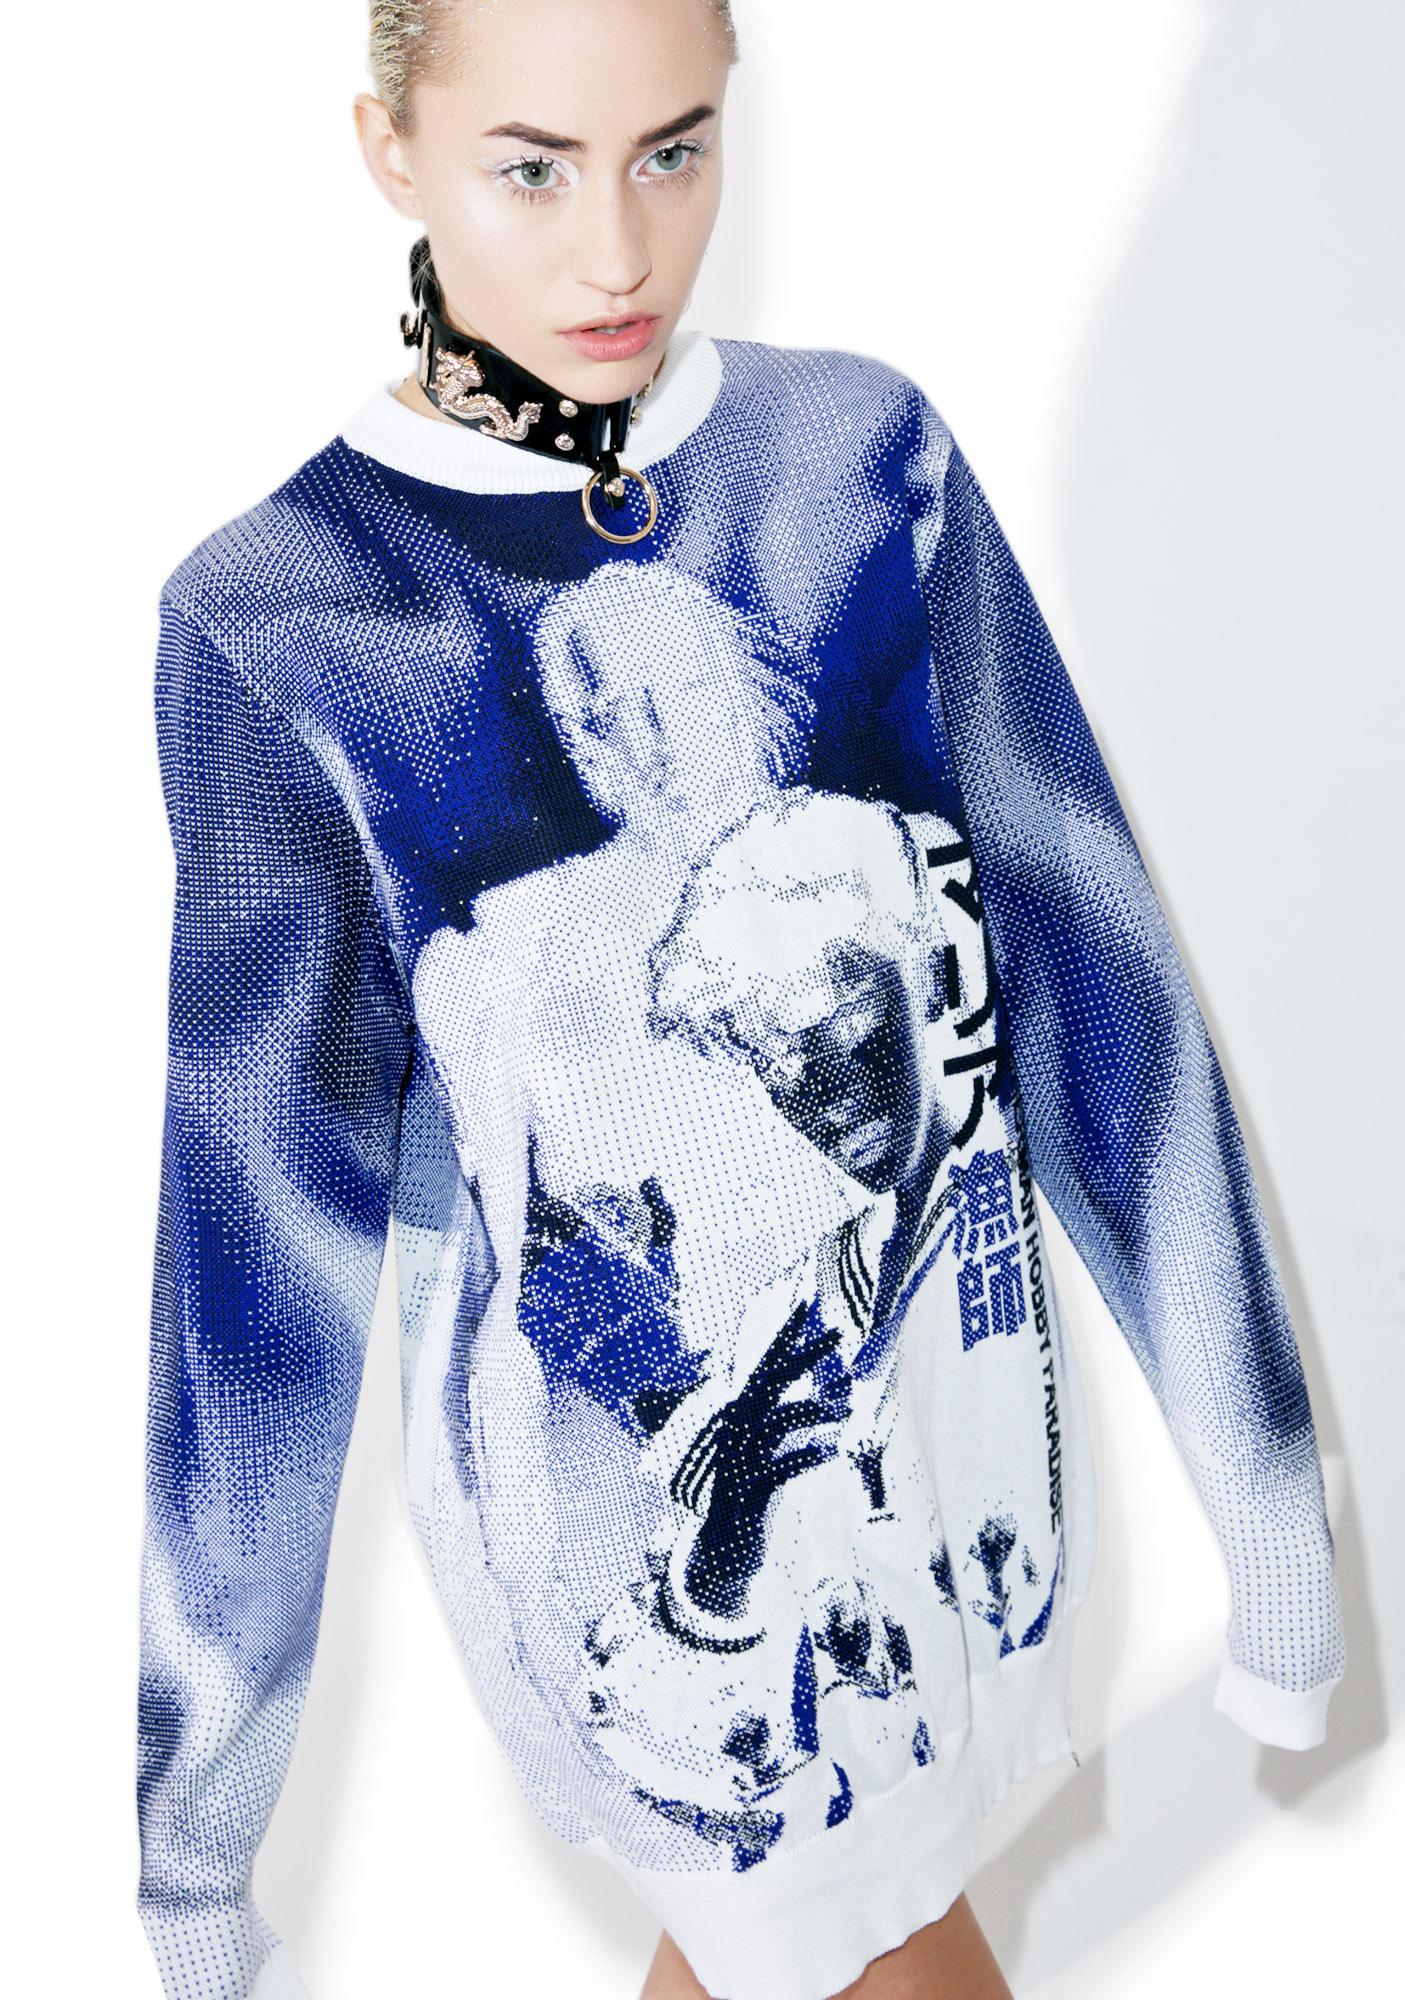 Maria ke Fisherman Knit Suke Sweater